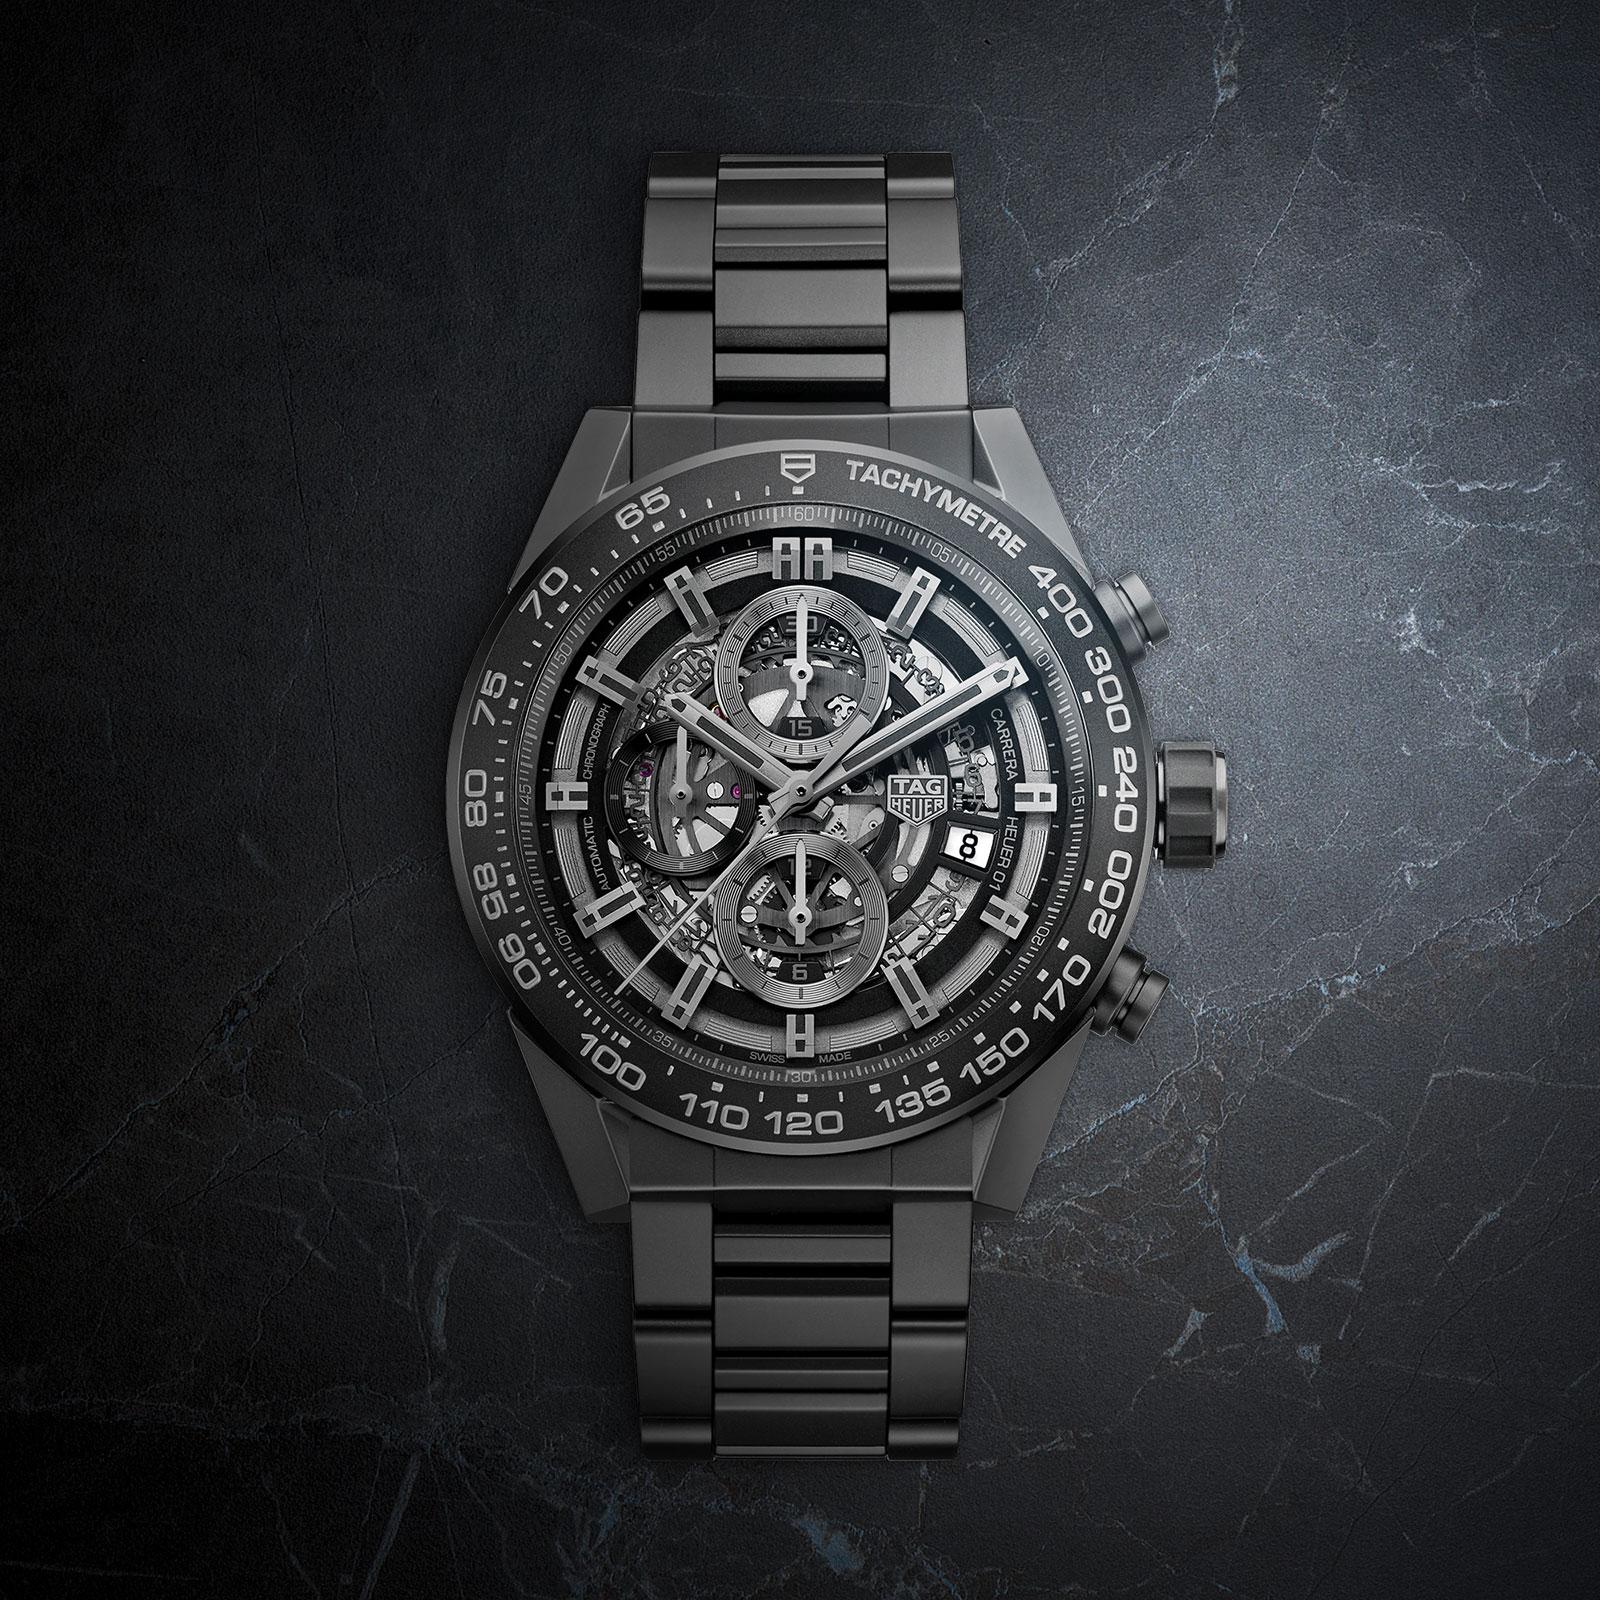 arrebatar Previamente dolor  Introducing the TAG Heuer Carrera Heuer-01 Chronograph in Black Ceramic |  SJX Watches